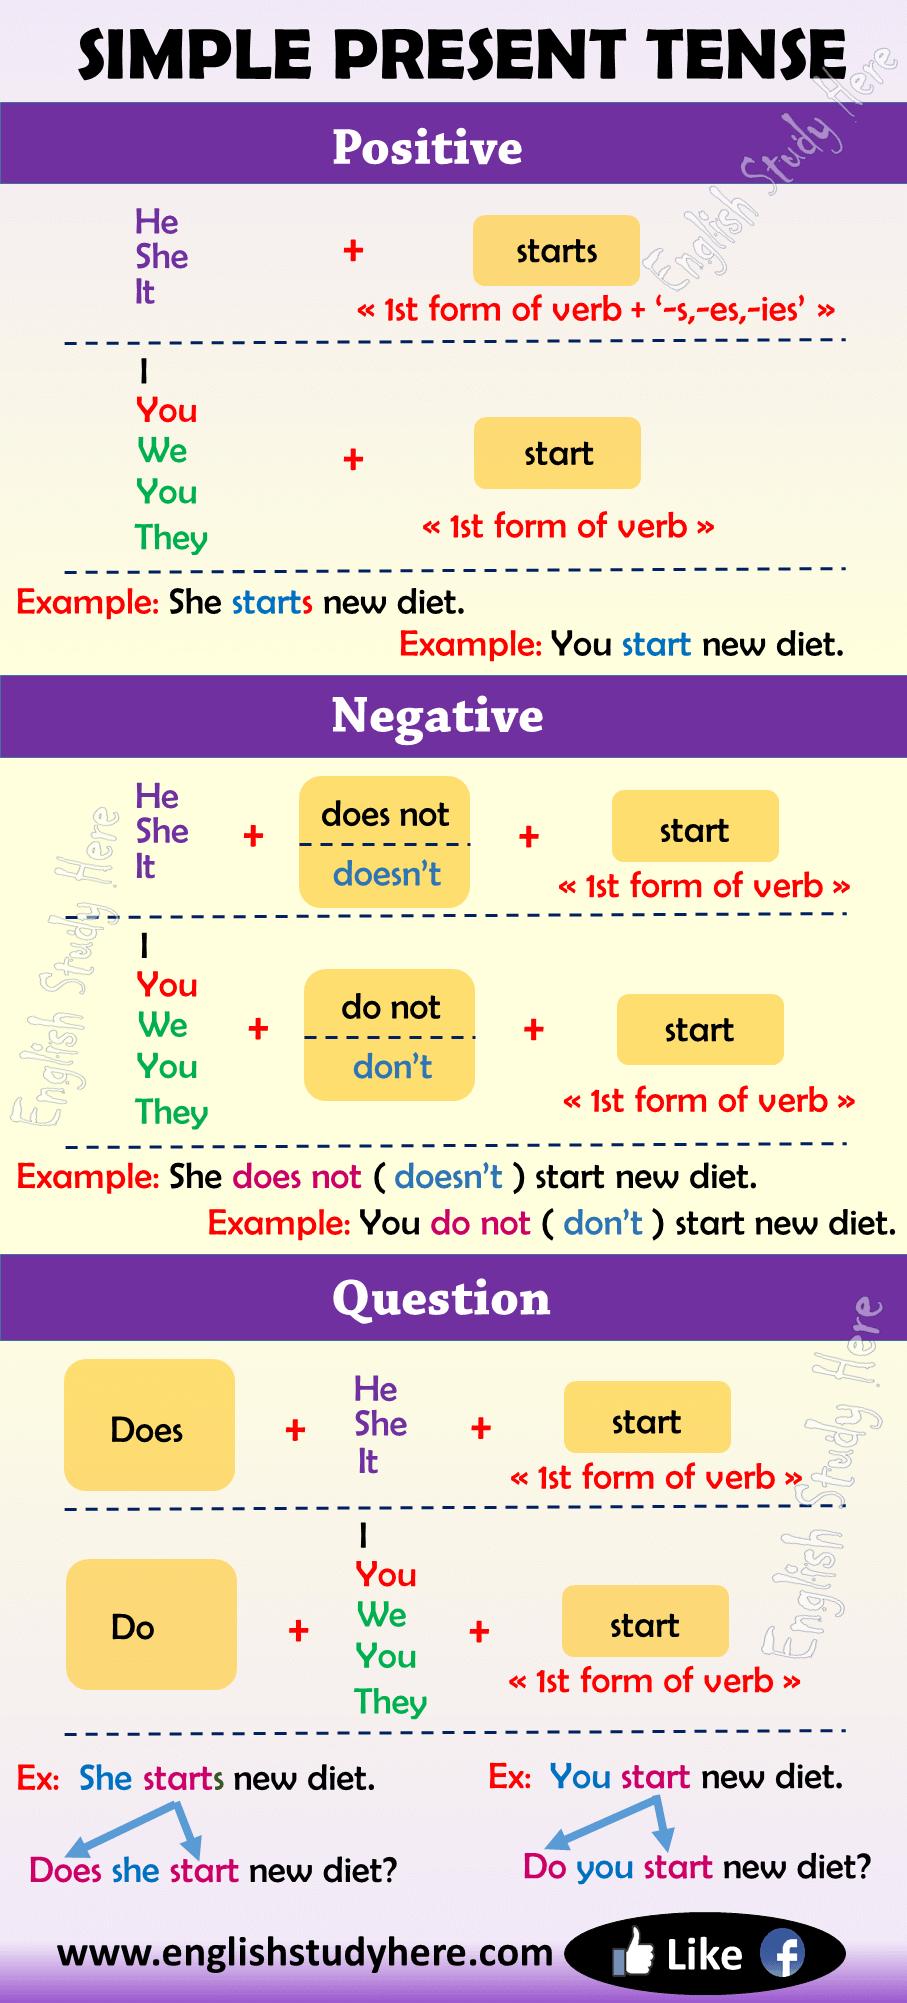 Simple Present Tense Lesson Plan | Study.com